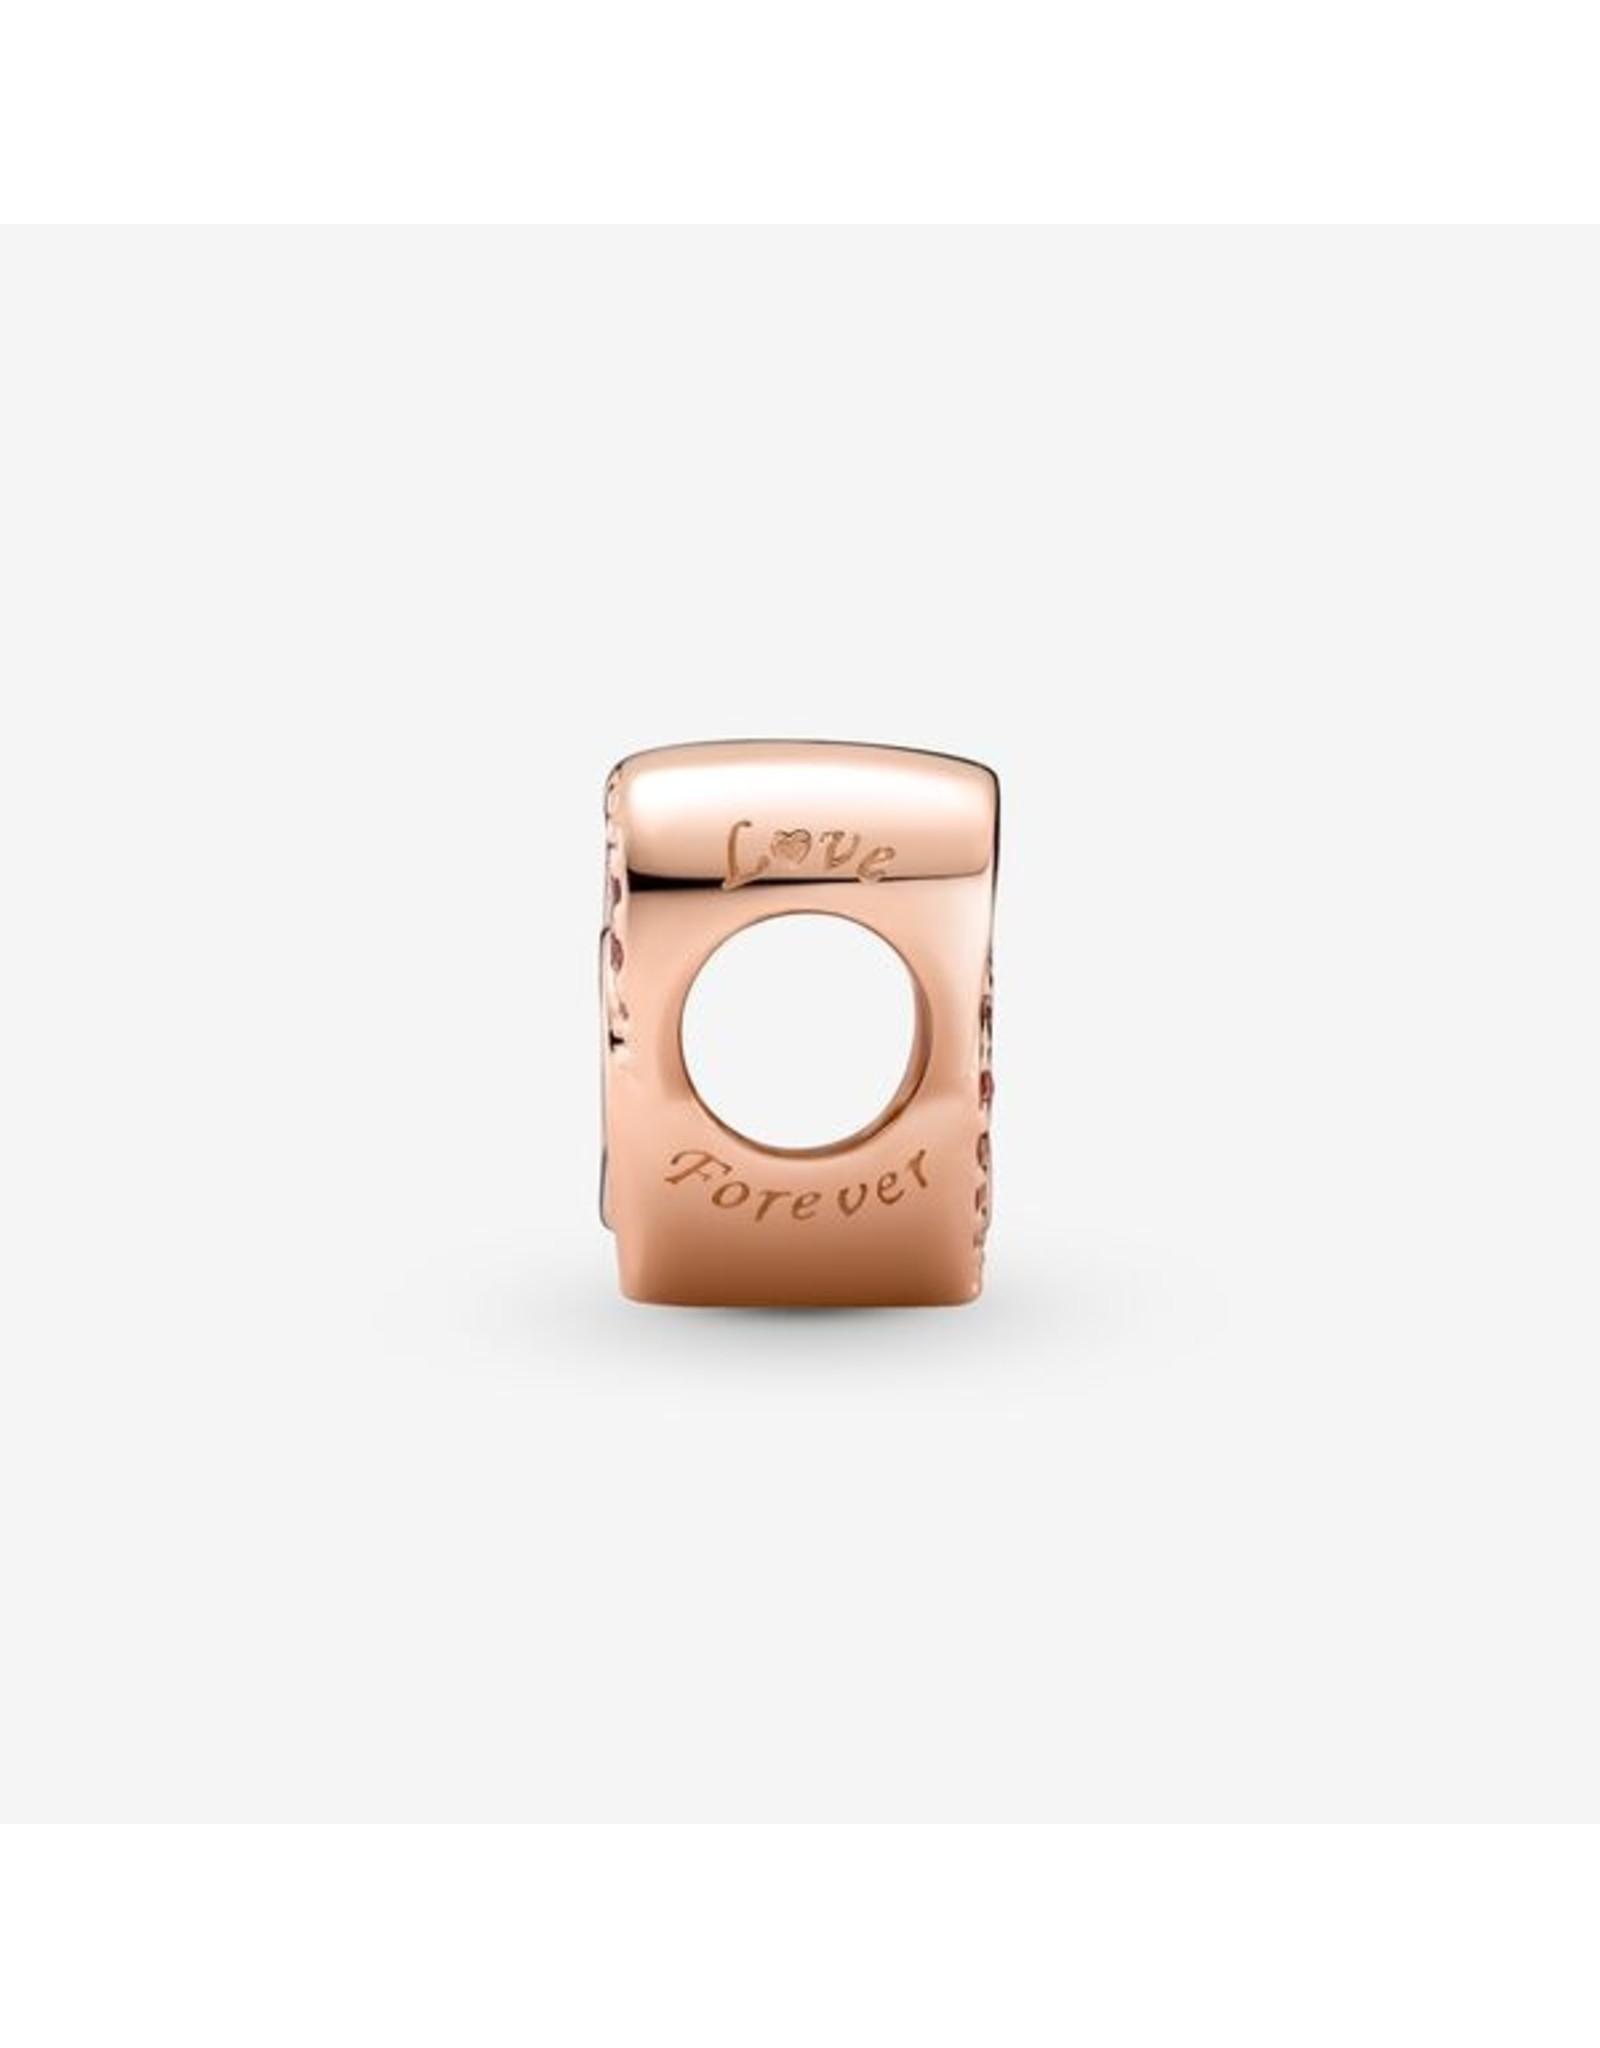 Pandora Pandora Charm,789529C01, Intertwined Love And Hearts Pink CZ, Rose Gold